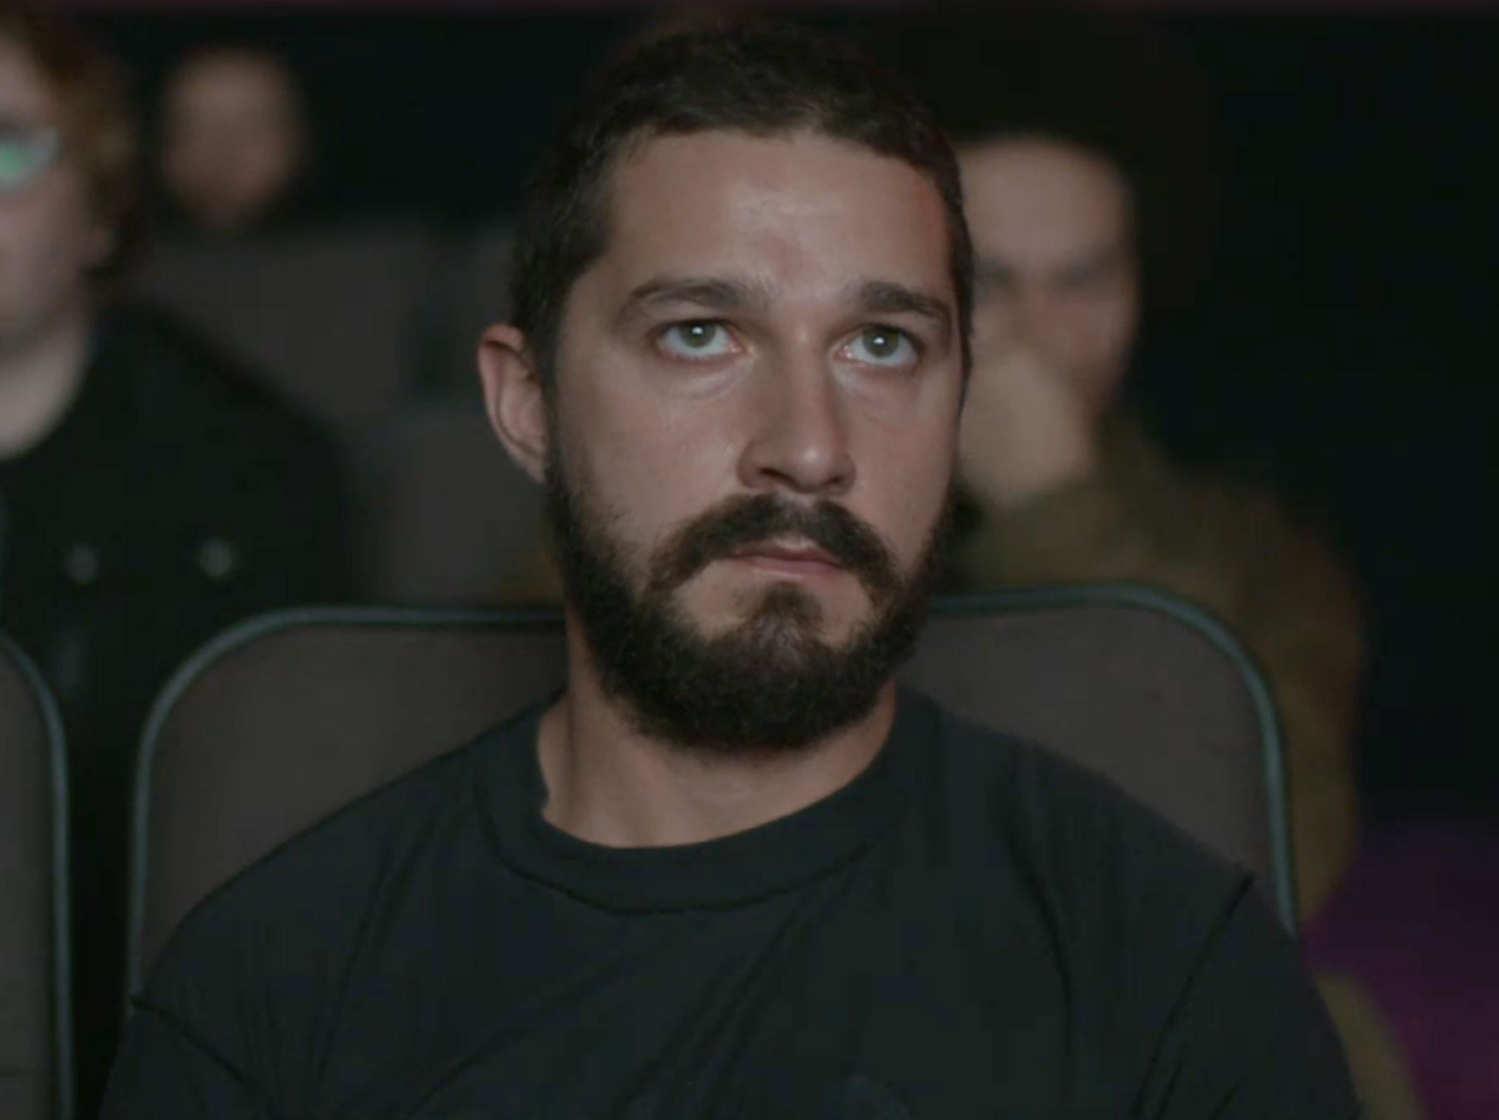 Shia LaBeouf In Expletive Tirade Against Steven Spielberg